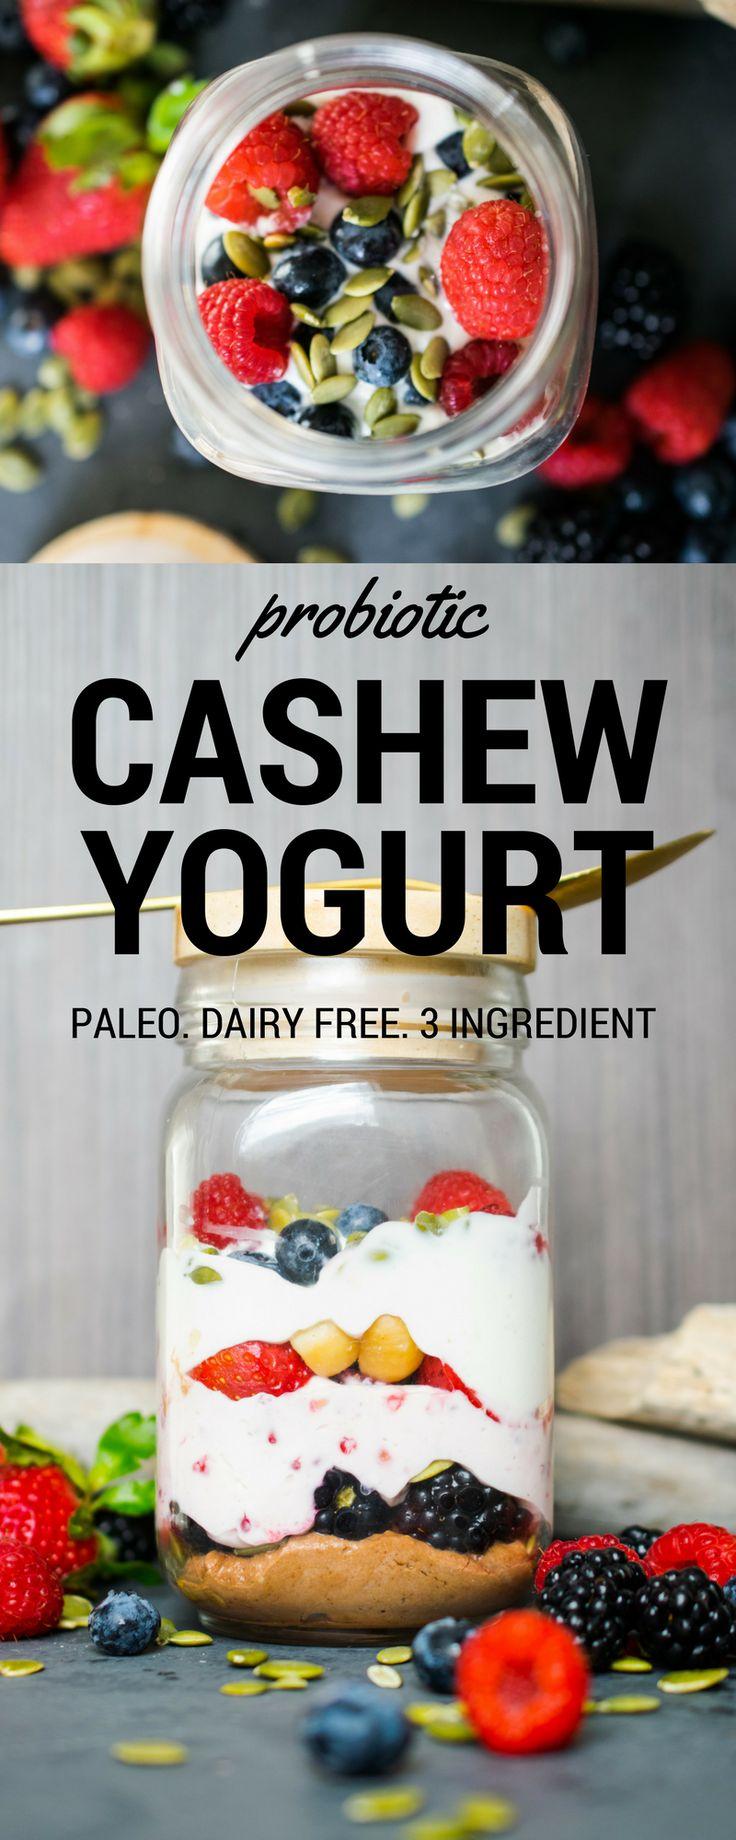 Probiotic Cashew Yogurt (Greek Style Paleo Yogurt) – Castaway Kitchen